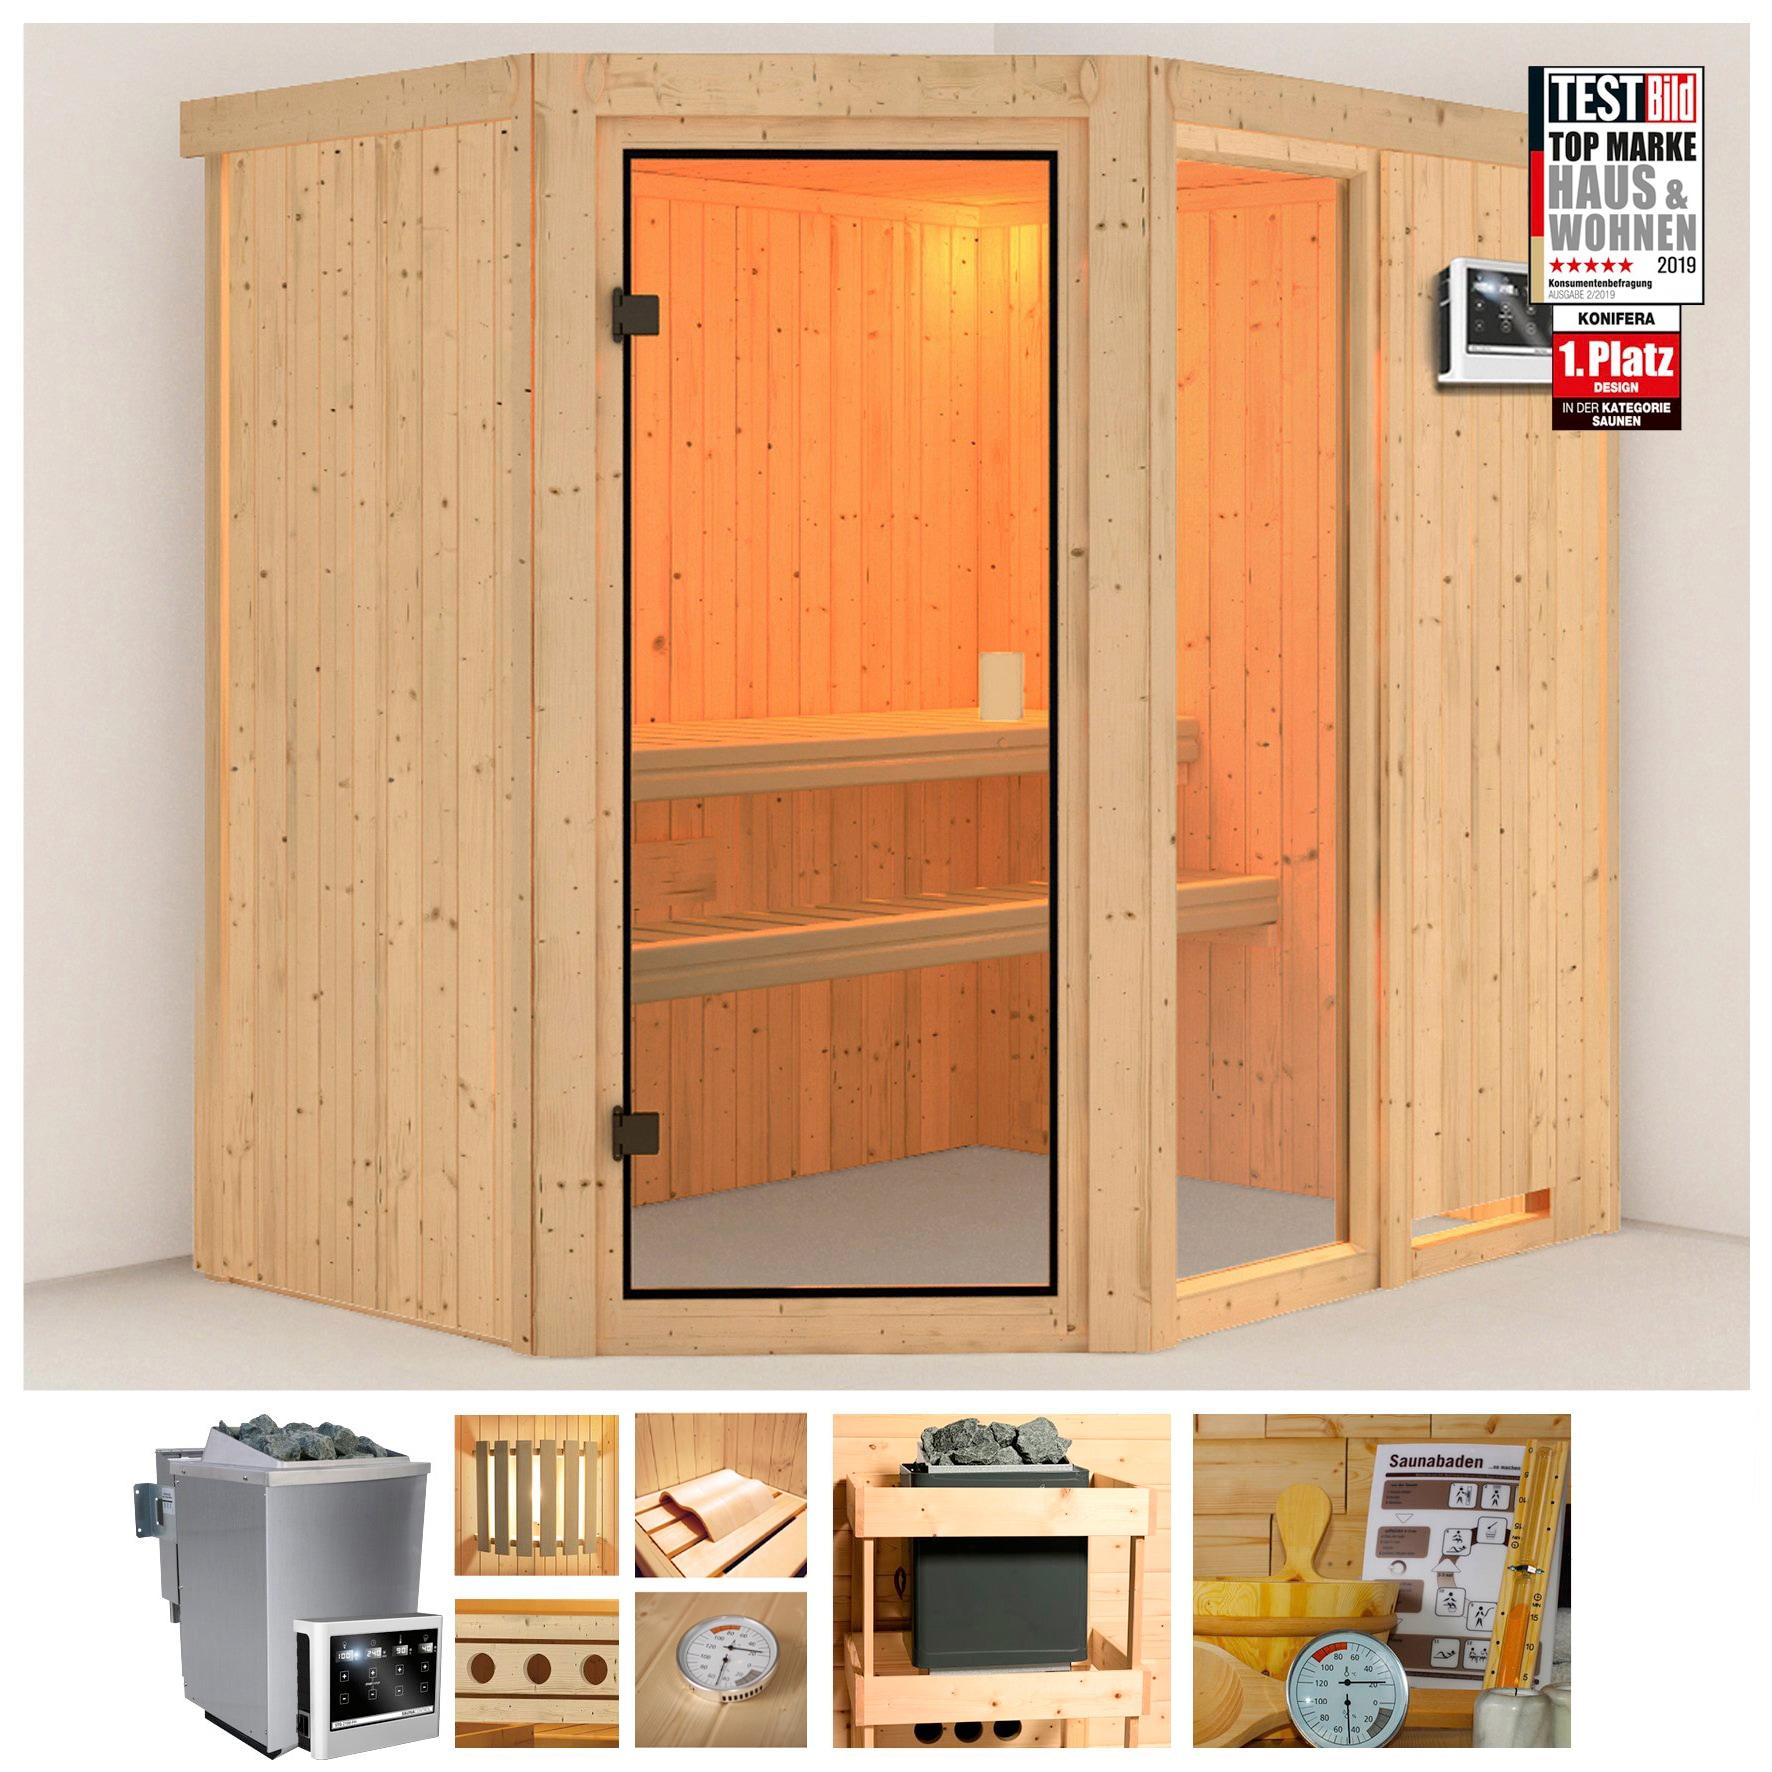 KONIFERA Sauna »Berga 1«, 196x151x198 cm, 9 kW Bio-Kombiofen mit ext. Steuerung | Bad > Sauna & Zubehör | KONIFERA